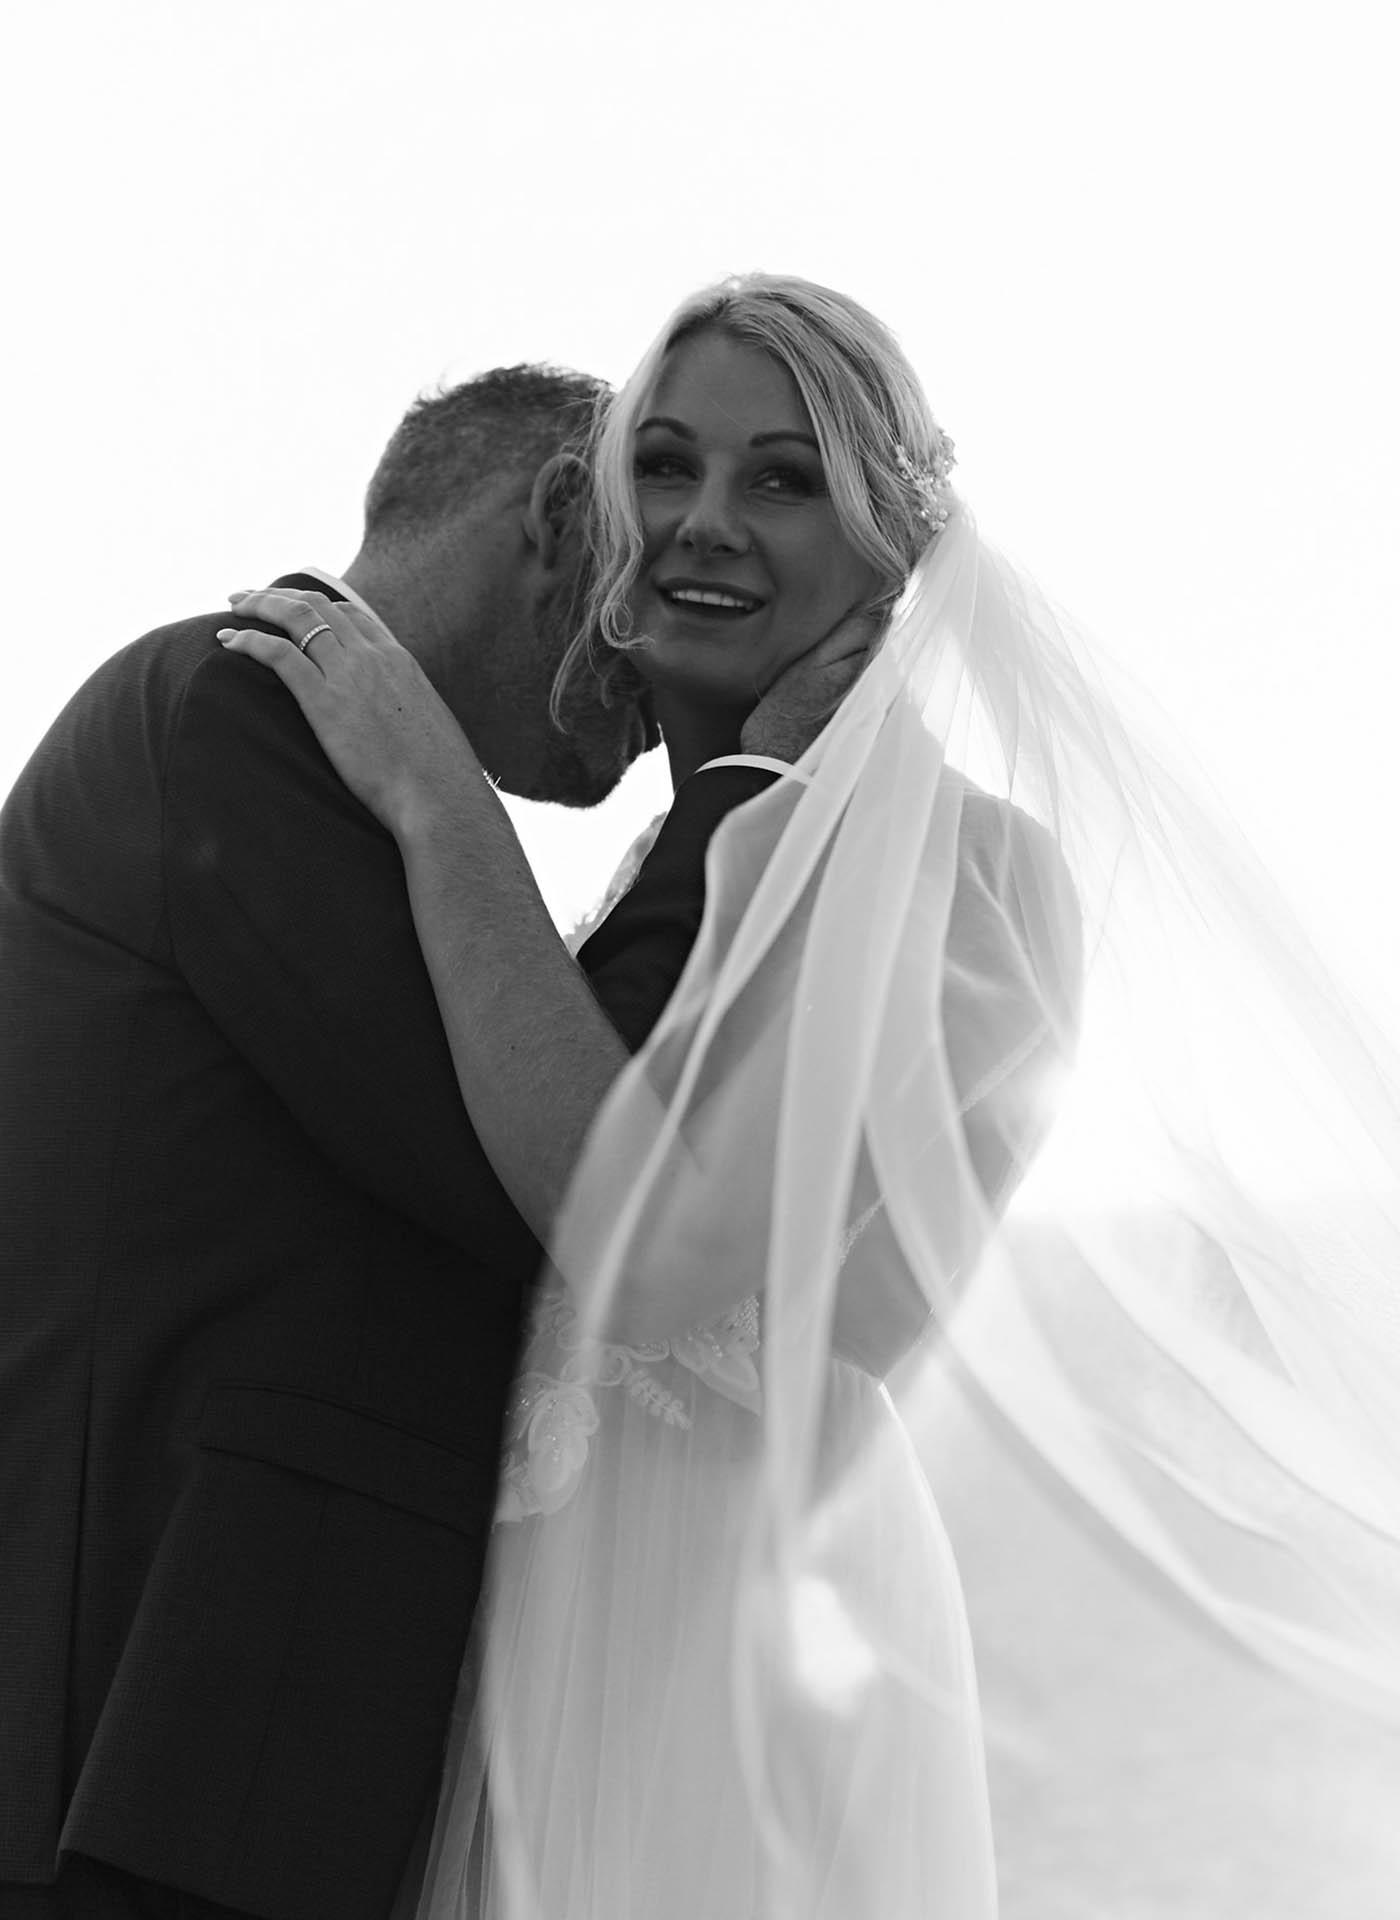 Newlyweds black and white photography